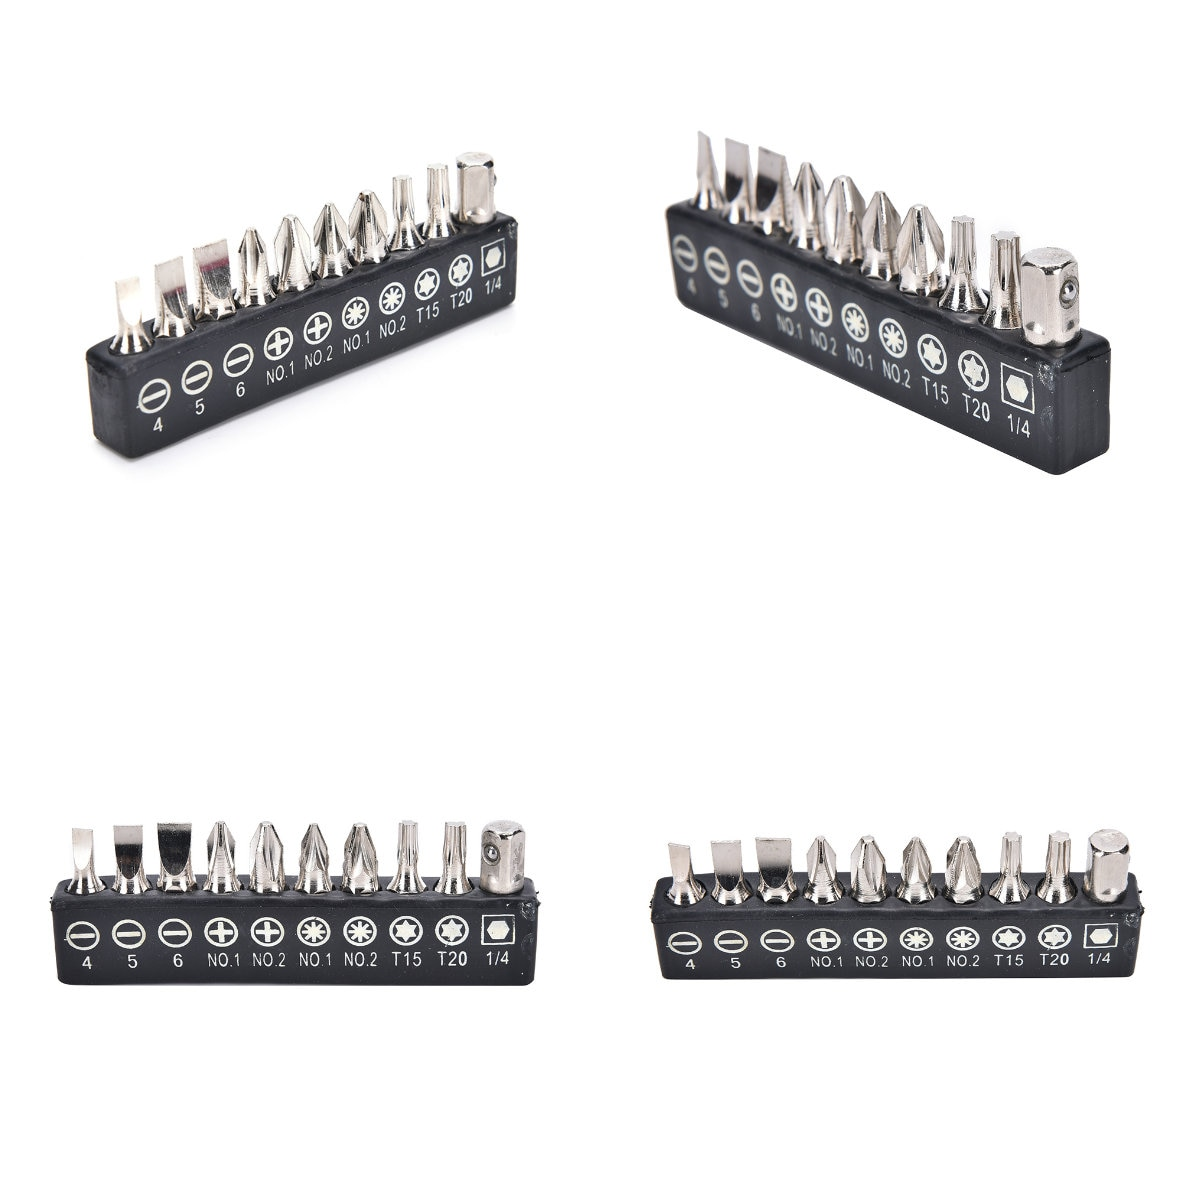 10pcs/Set Multifunctionl Versatile Screwdrivers Electric Alloy Steel Screwdriver Bits For Screwdriver Set